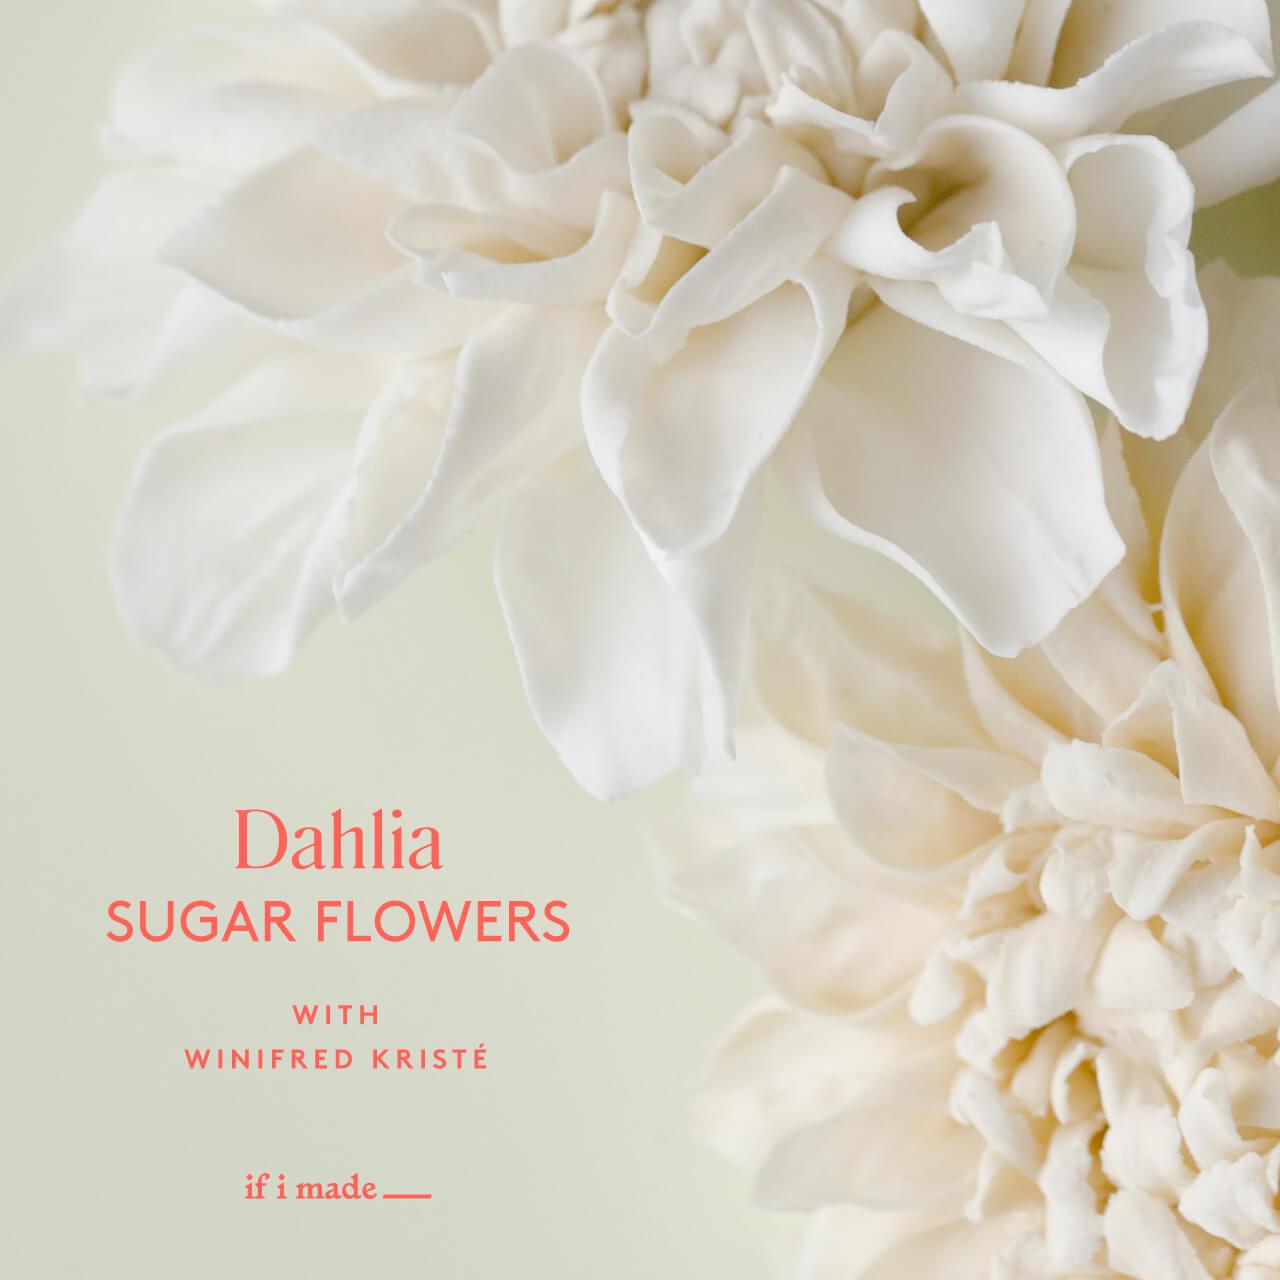 Dahlia Sugar Flowers with Winifred Kristé